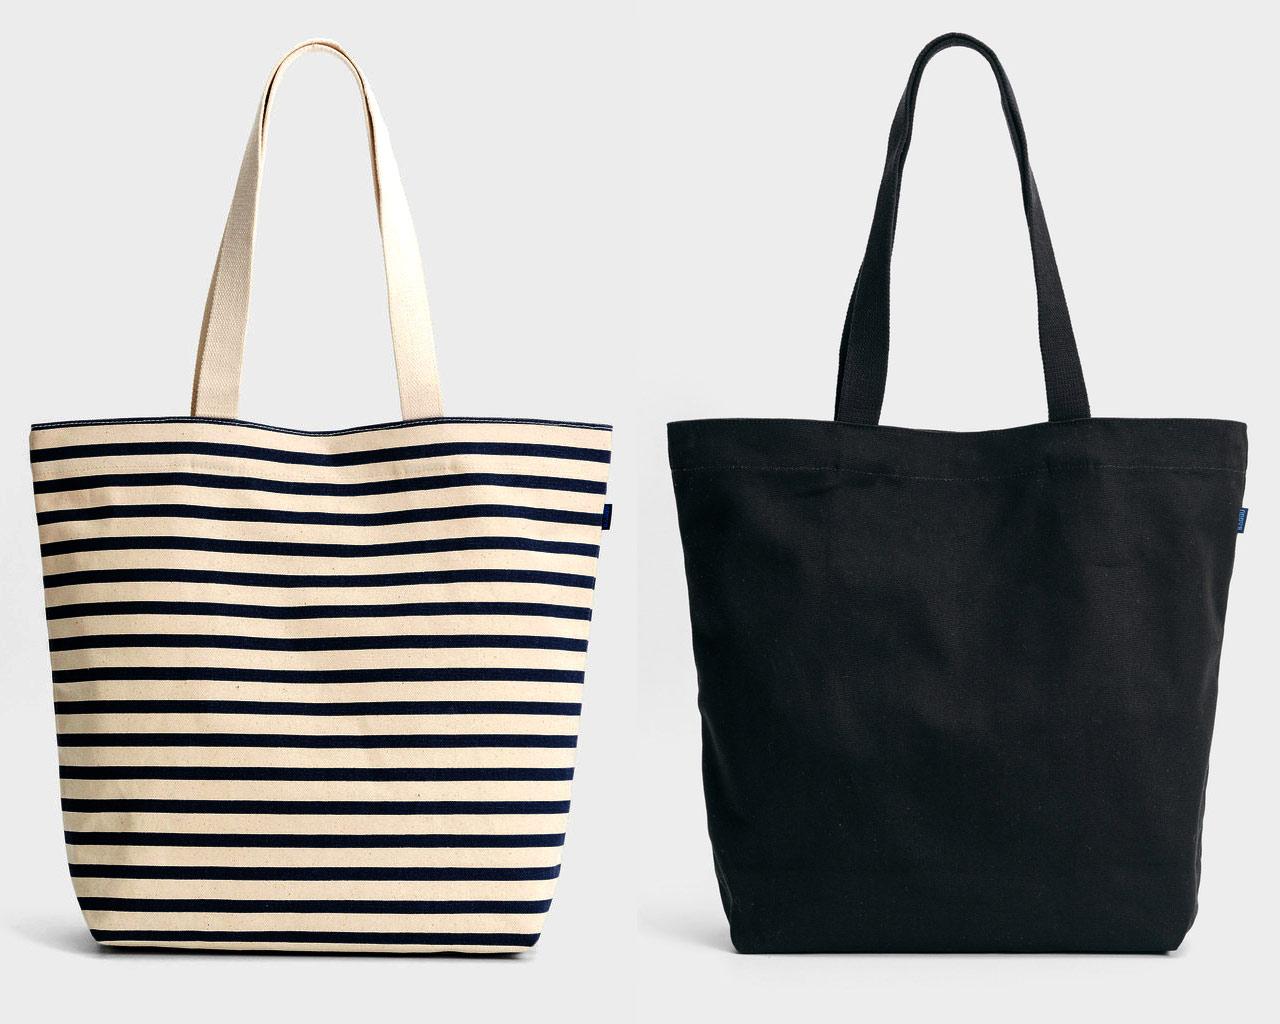 Baggu バグゥ Tote Bag Canvas Shopper Bag Canvas Shopper Bag Horizontal Stripes Black Bug